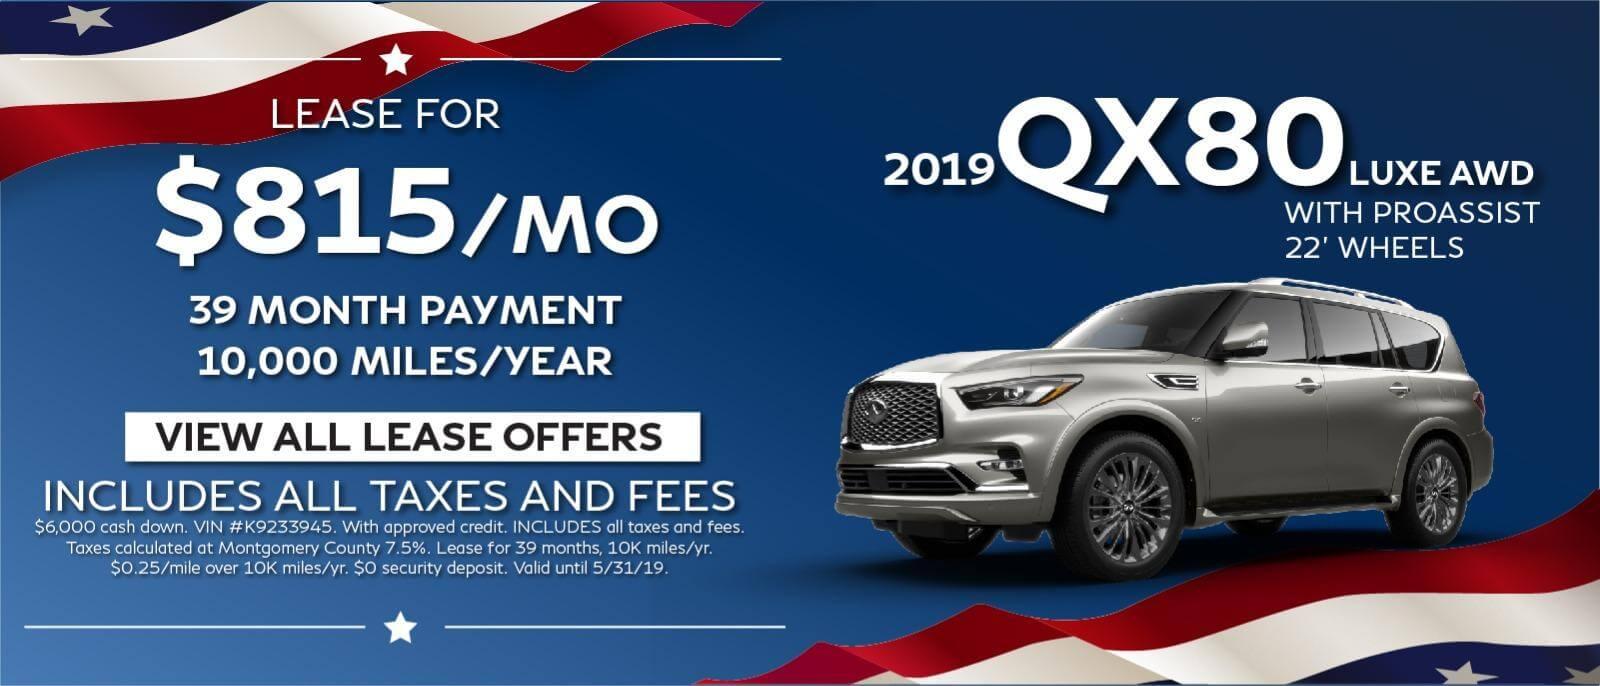 2019 QX80 OFFER